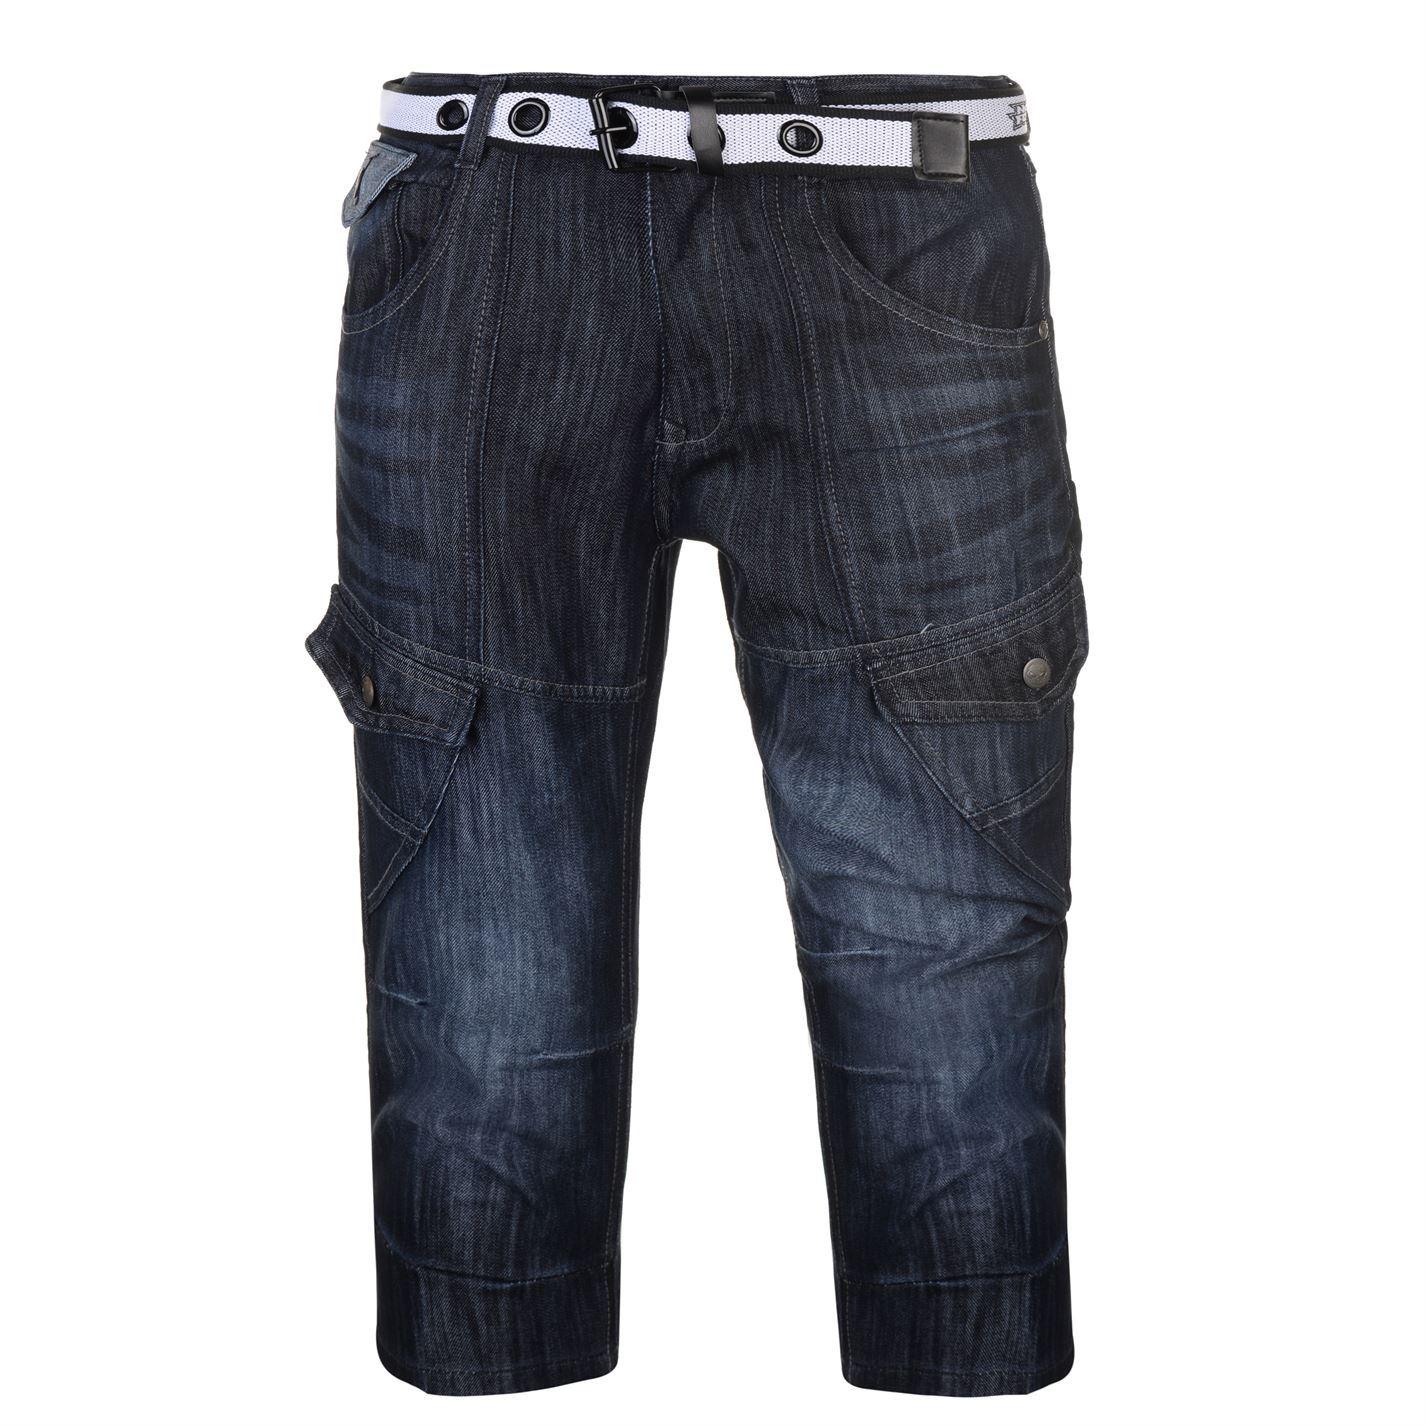 No-Fear-Belted-Cargo-Shorts-Mens-Bottoms-Short-Pants-Summerwear thumbnail 7